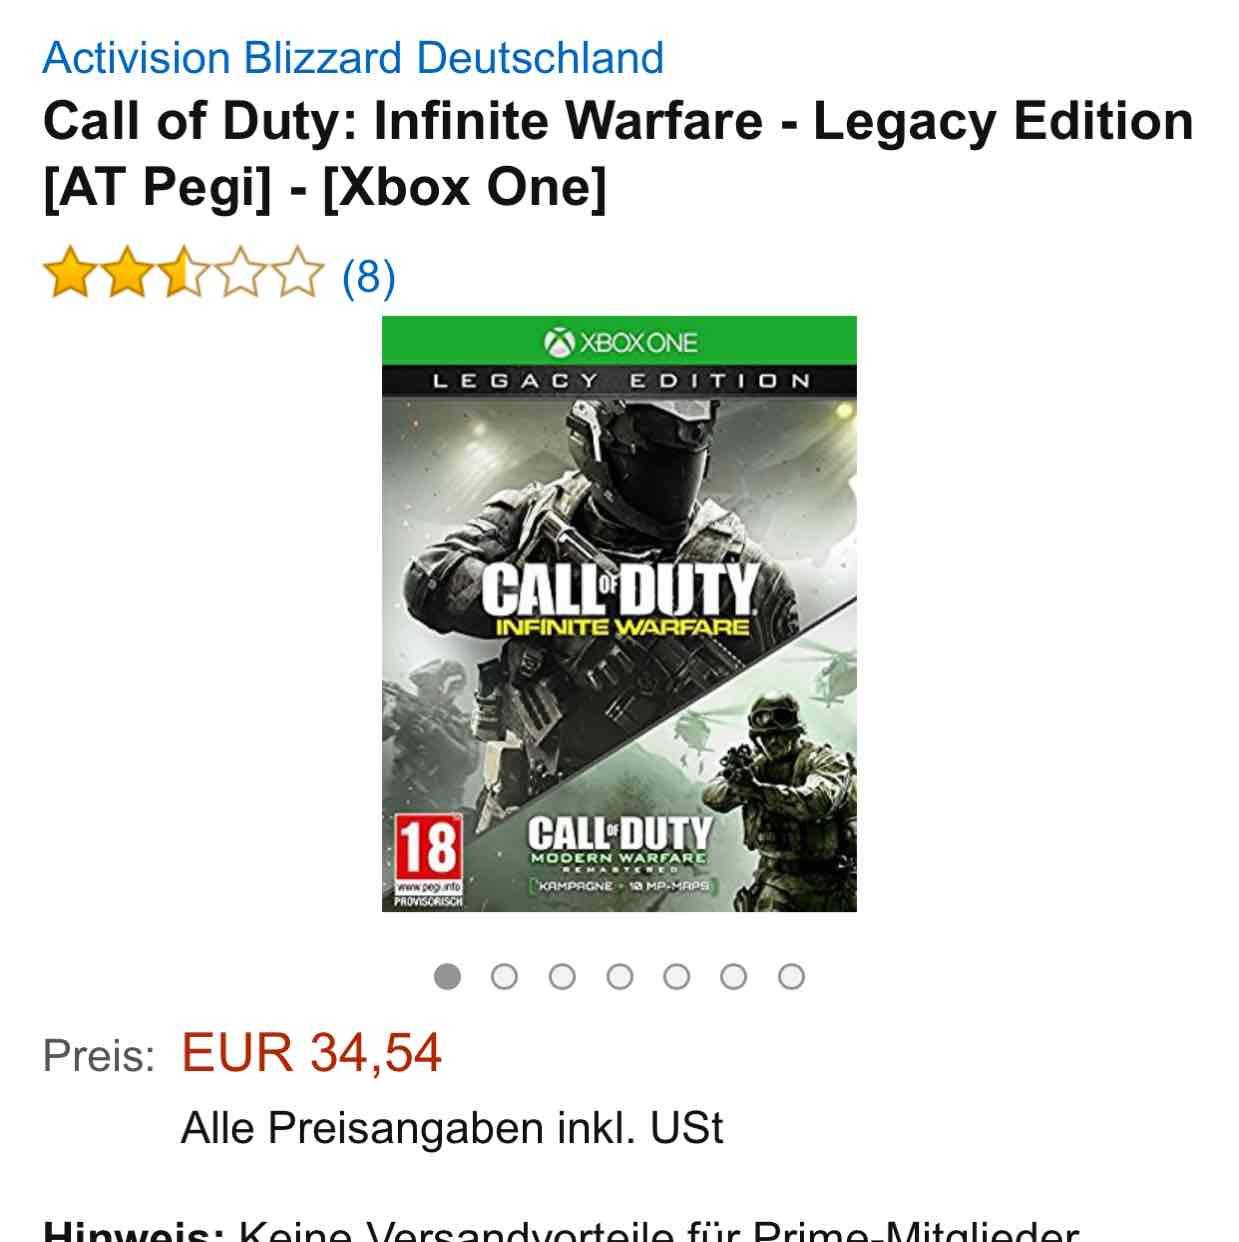 [Amazon] Call of Duty Infinite Warfare Legacy Edition Xbox One